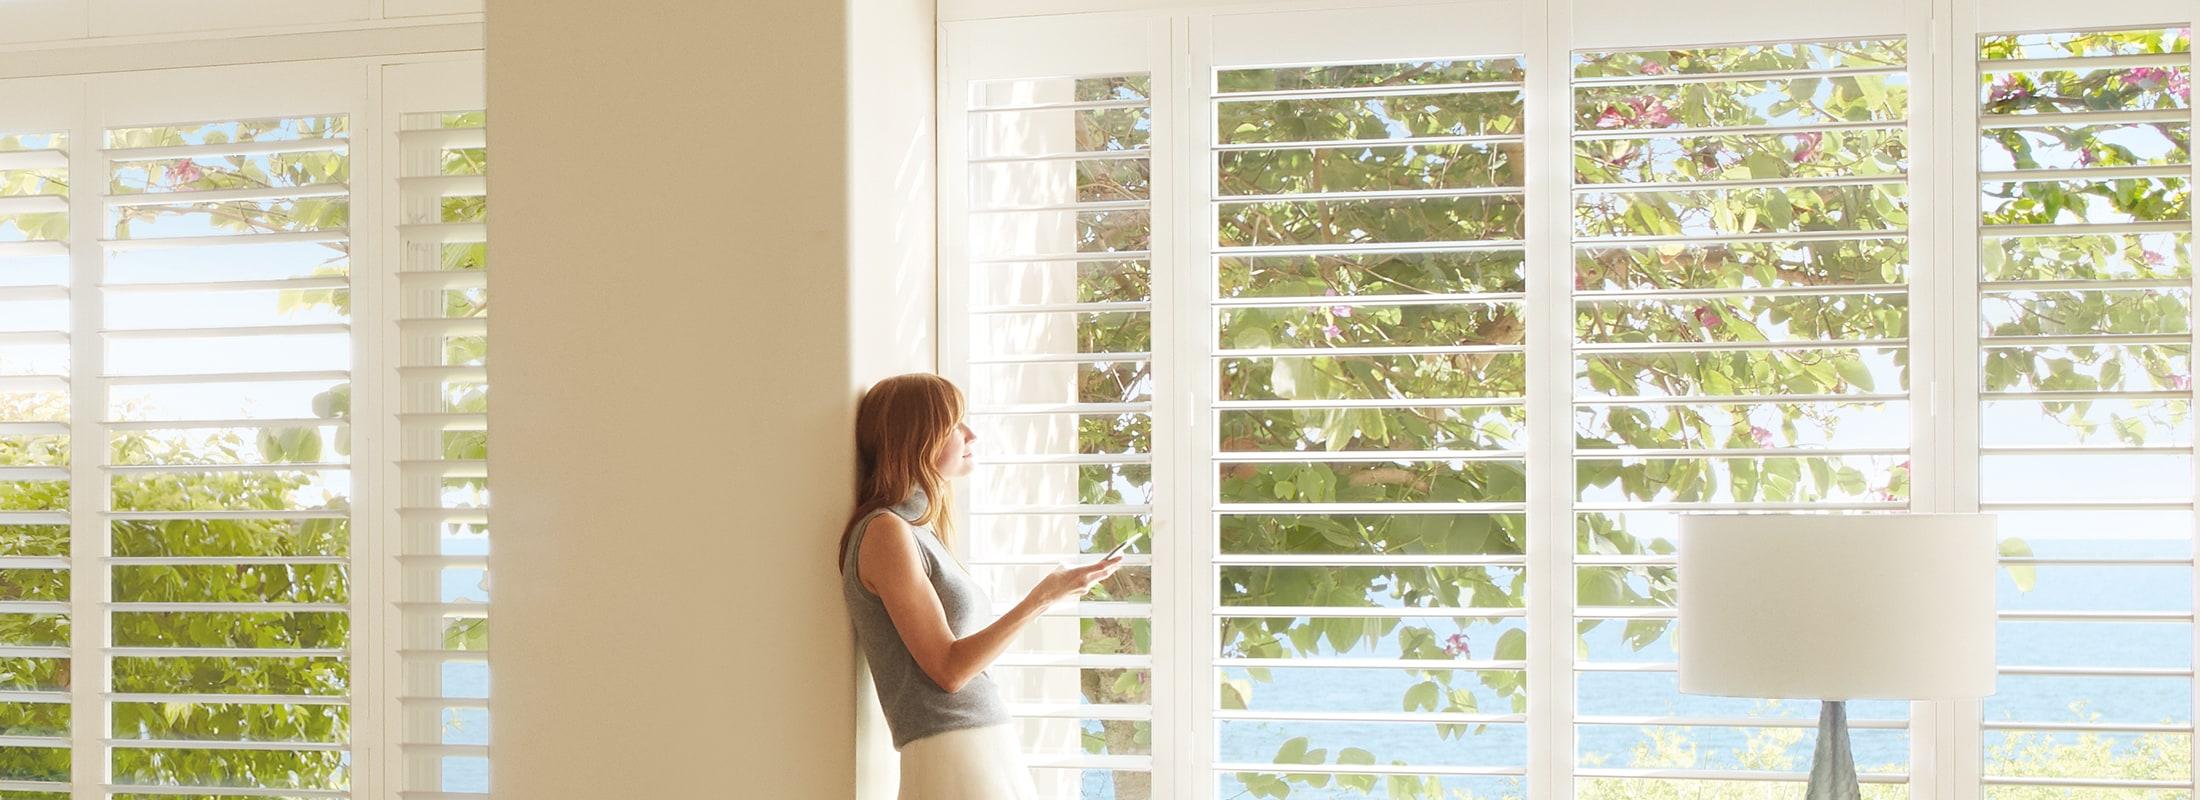 polysatin-shutters-palm-beach-in-bright-white.jpg